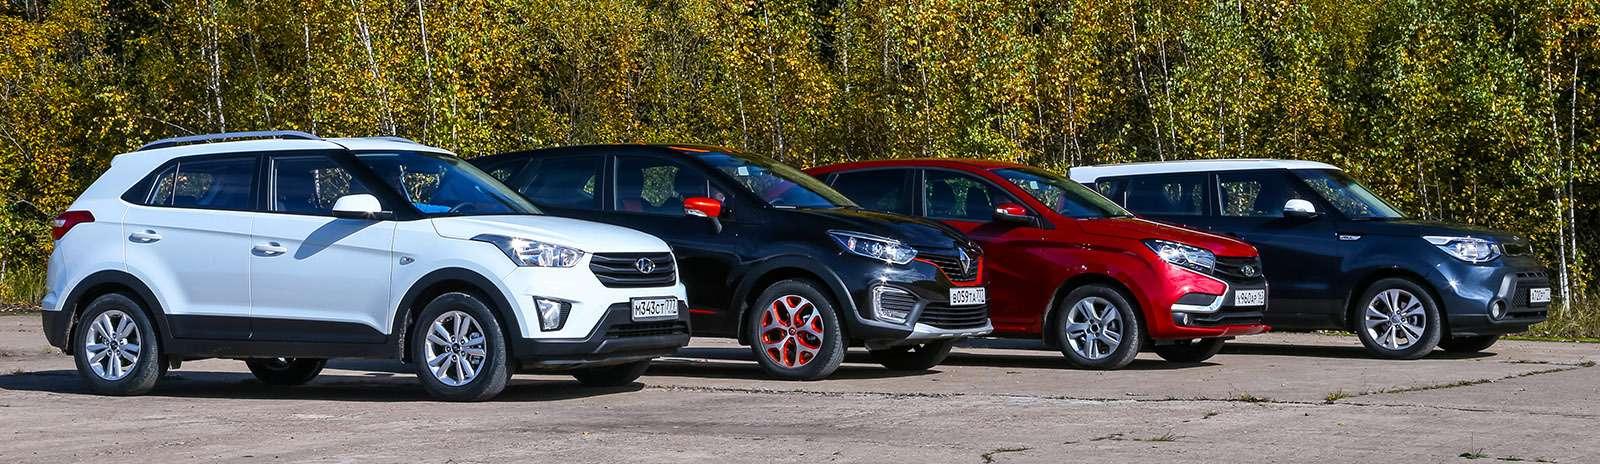 Hyundai Creta, Renault Kaptur, Kia Soul, Lada XRAY: разборка переднеприводных— фото 657325